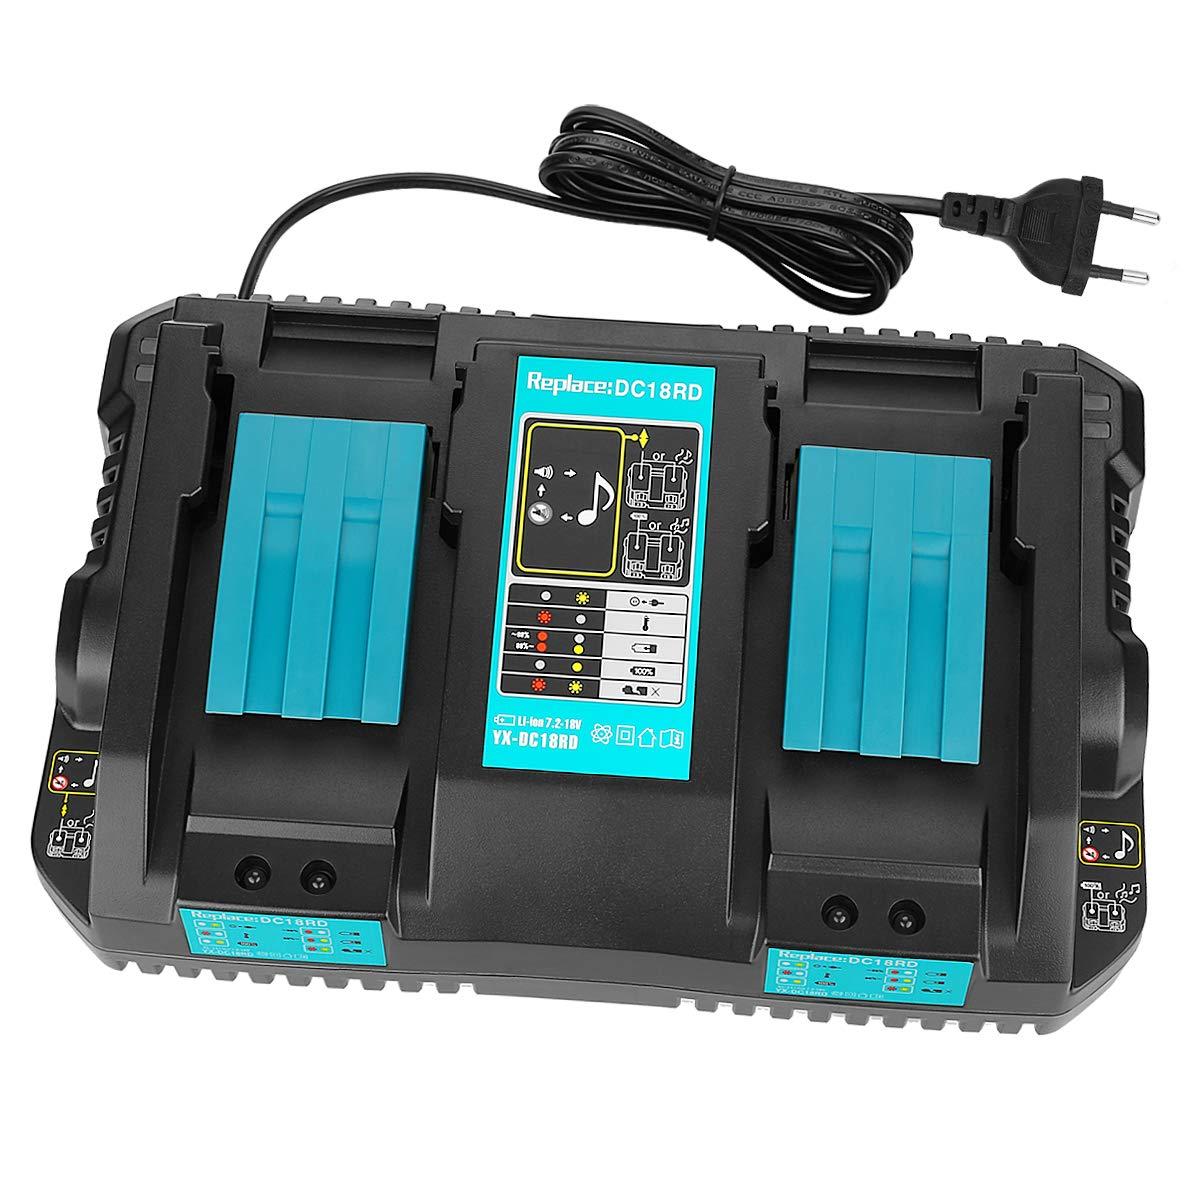 OPSON 4A Chargeur Double Port DC18RD Chargeur pour Makita 7.2V ~ 18V BL1815 BL1830 BL1840 BL1850 BL1860 BL1430